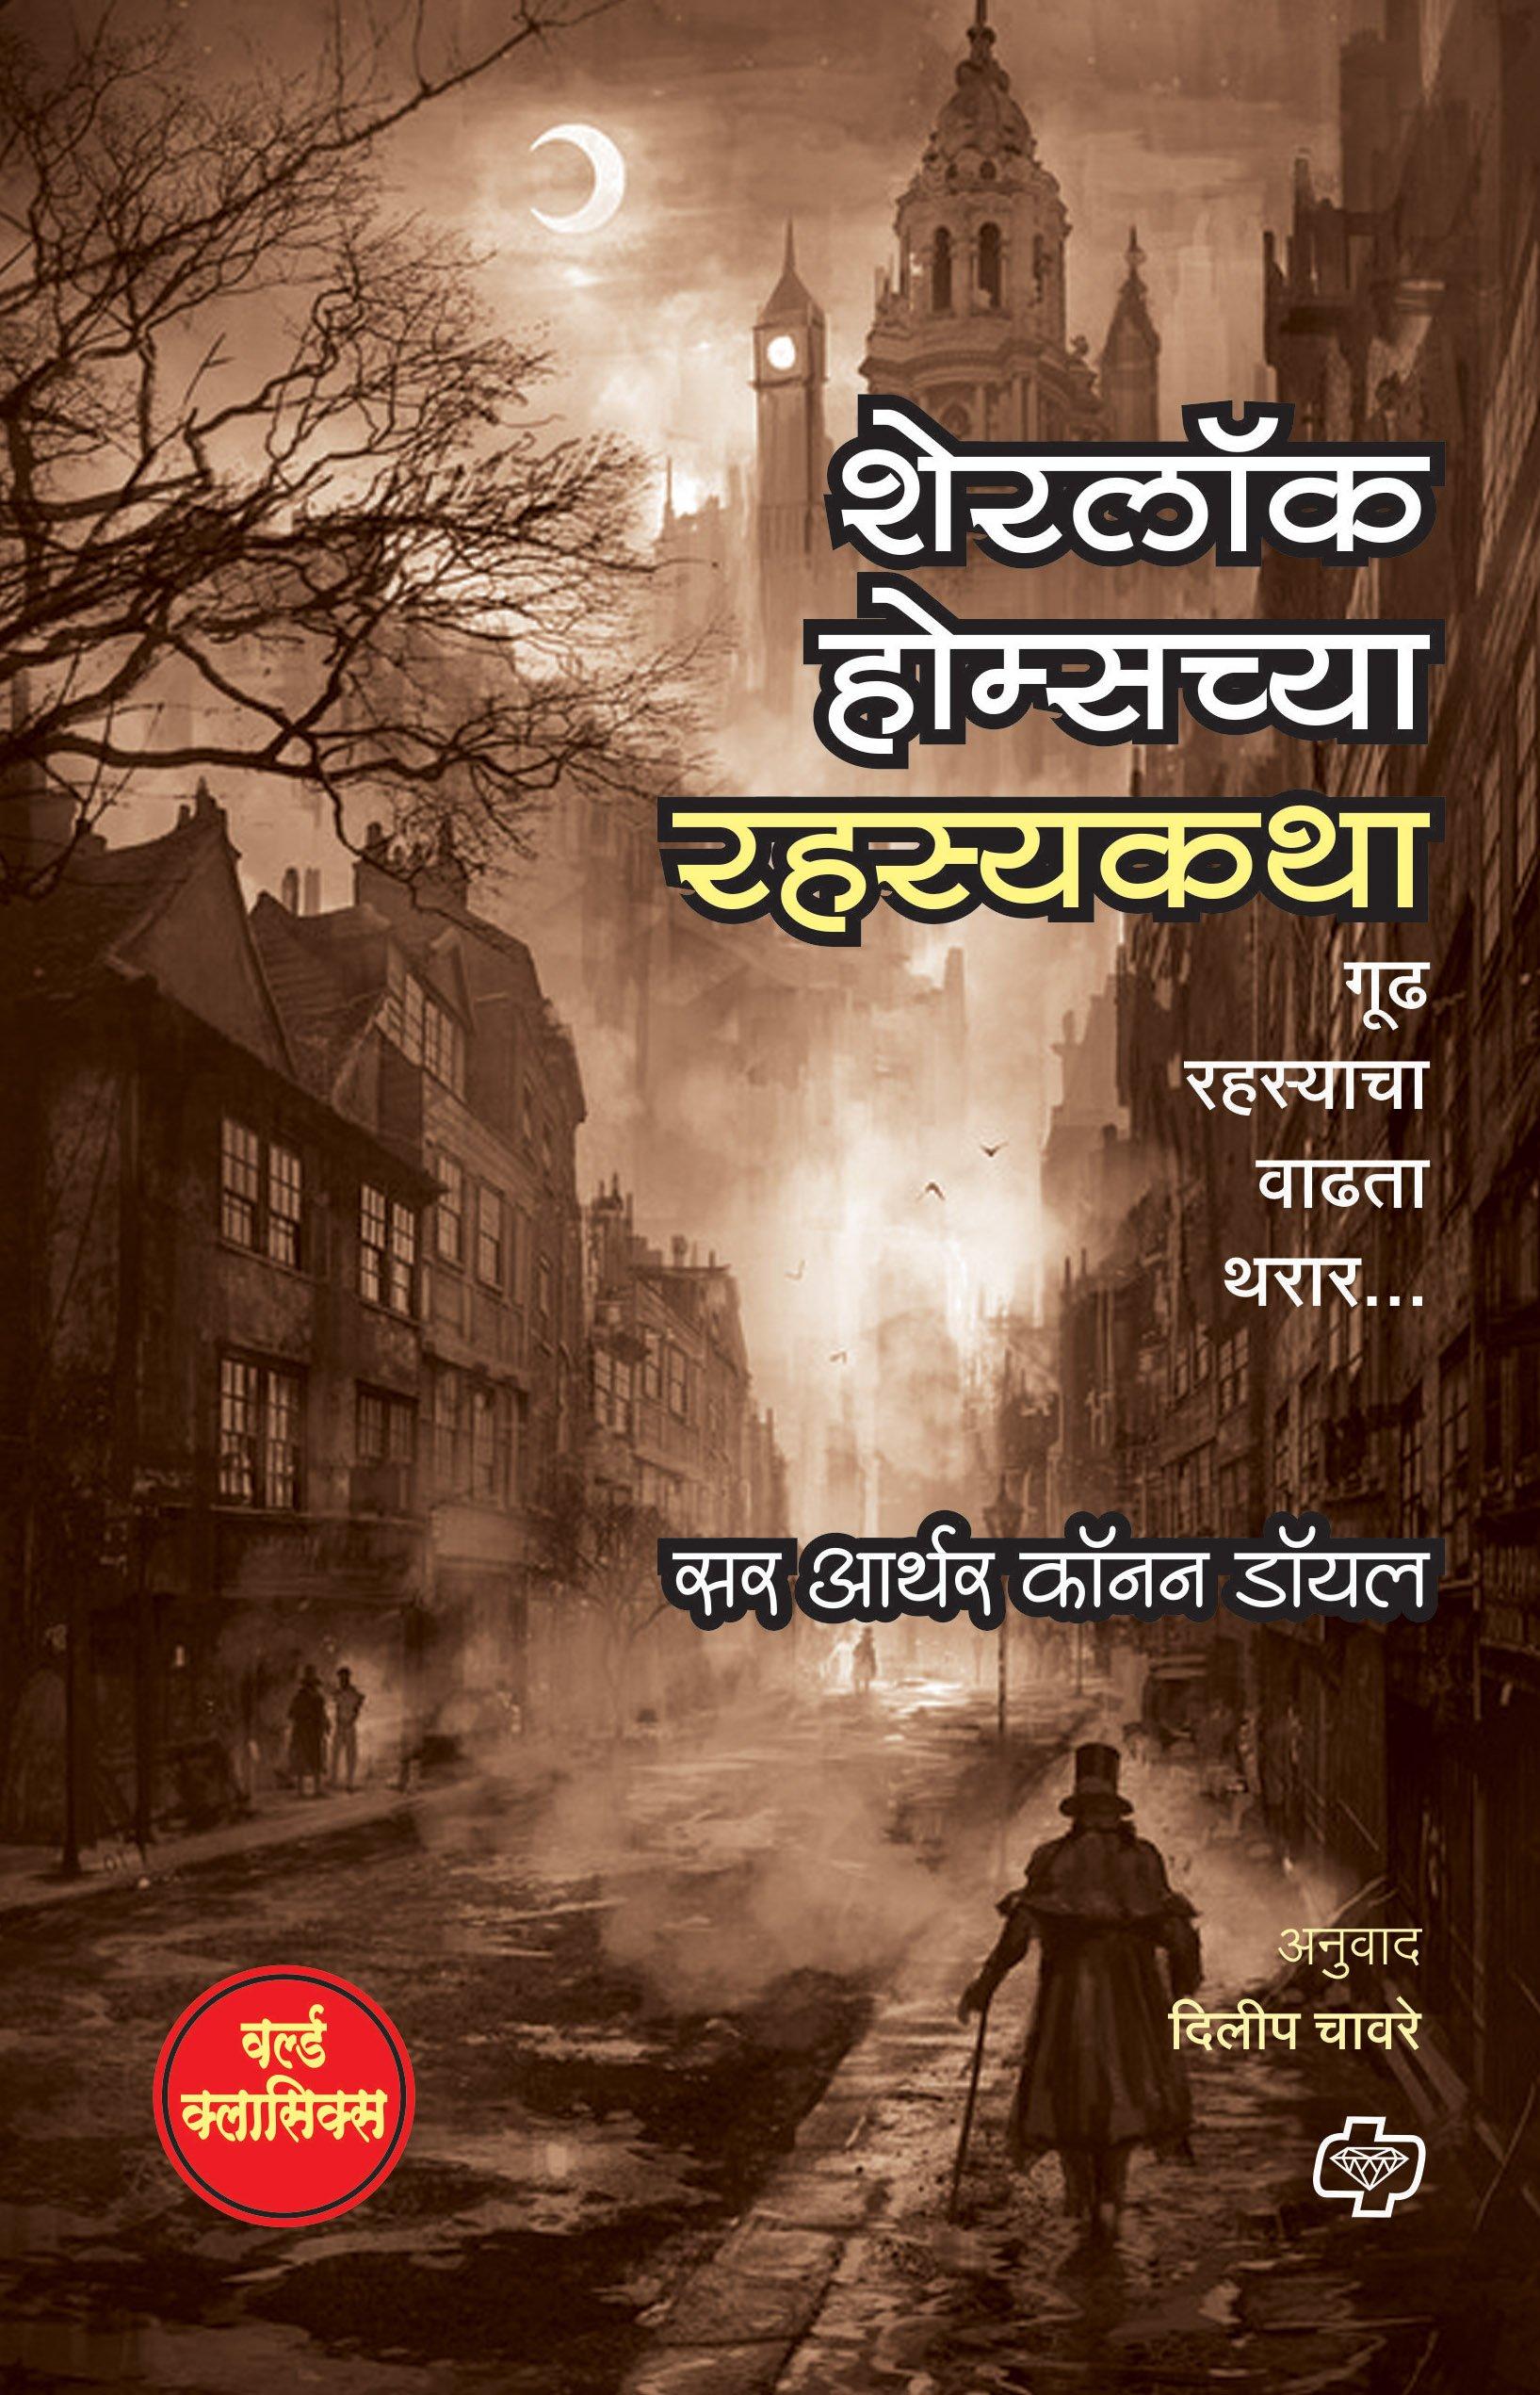 Buy sherlock holmschya rahasyakatha marathi book online at low buy sherlock holmschya rahasyakatha marathi book online at low prices in india sherlock holmschya rahasyakatha marathi reviews ratings amazon fandeluxe Images